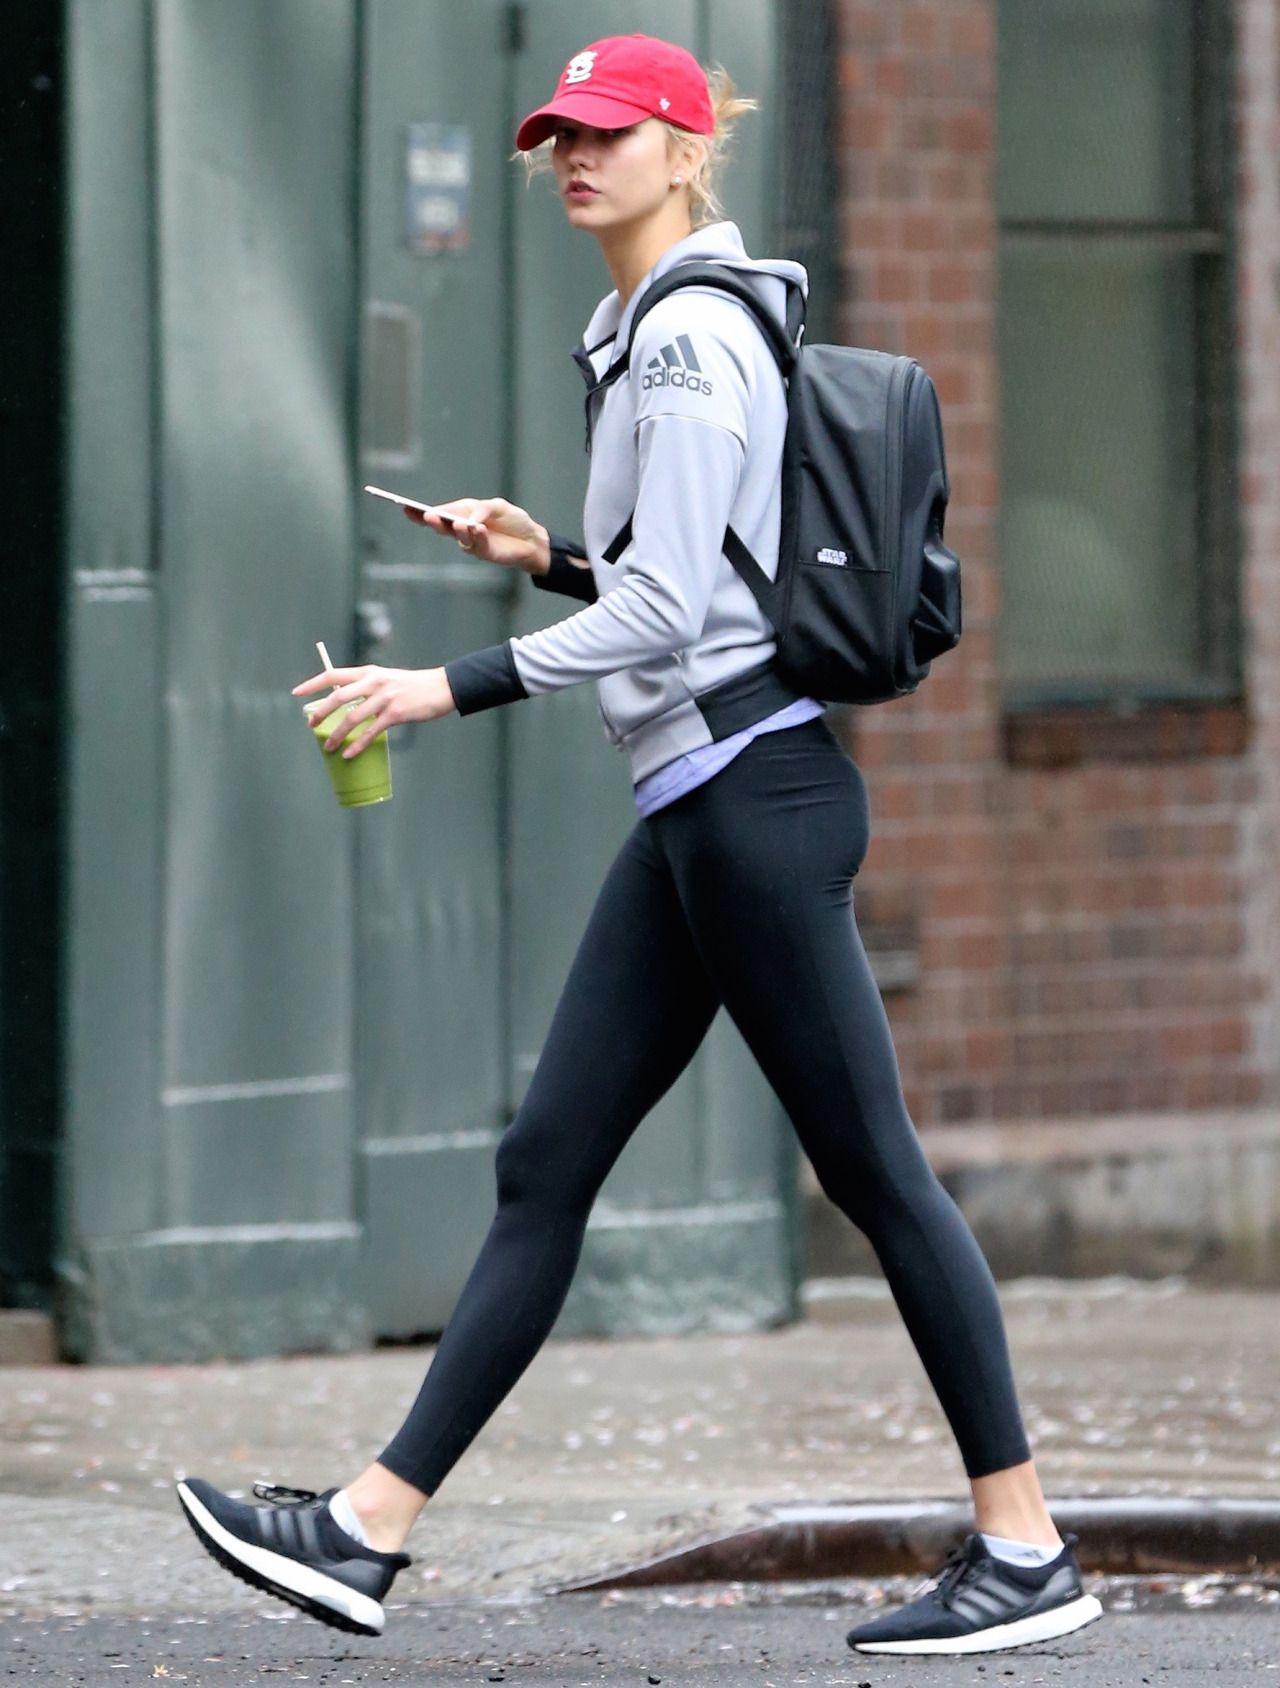 8831a4b2ed13a Sunshine Karlie Kloss : Photo | Athleisure | Fashion, Karlie ...